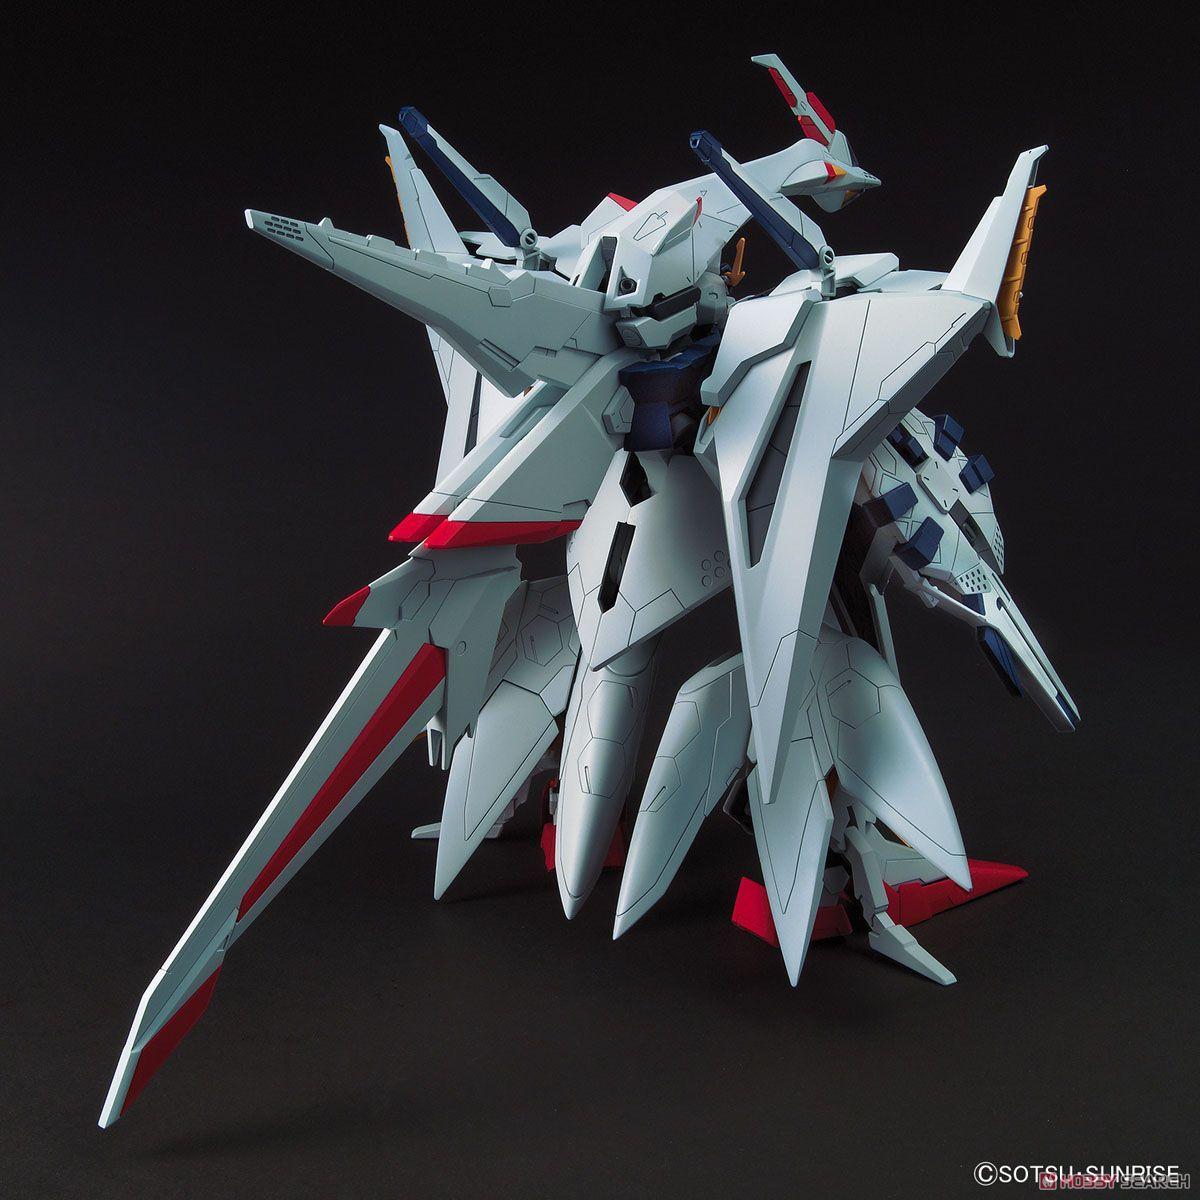 HGUC 1/144『ペーネロペー』機動戦士ガンダム 閃光のハサウェイ プラモデル-012